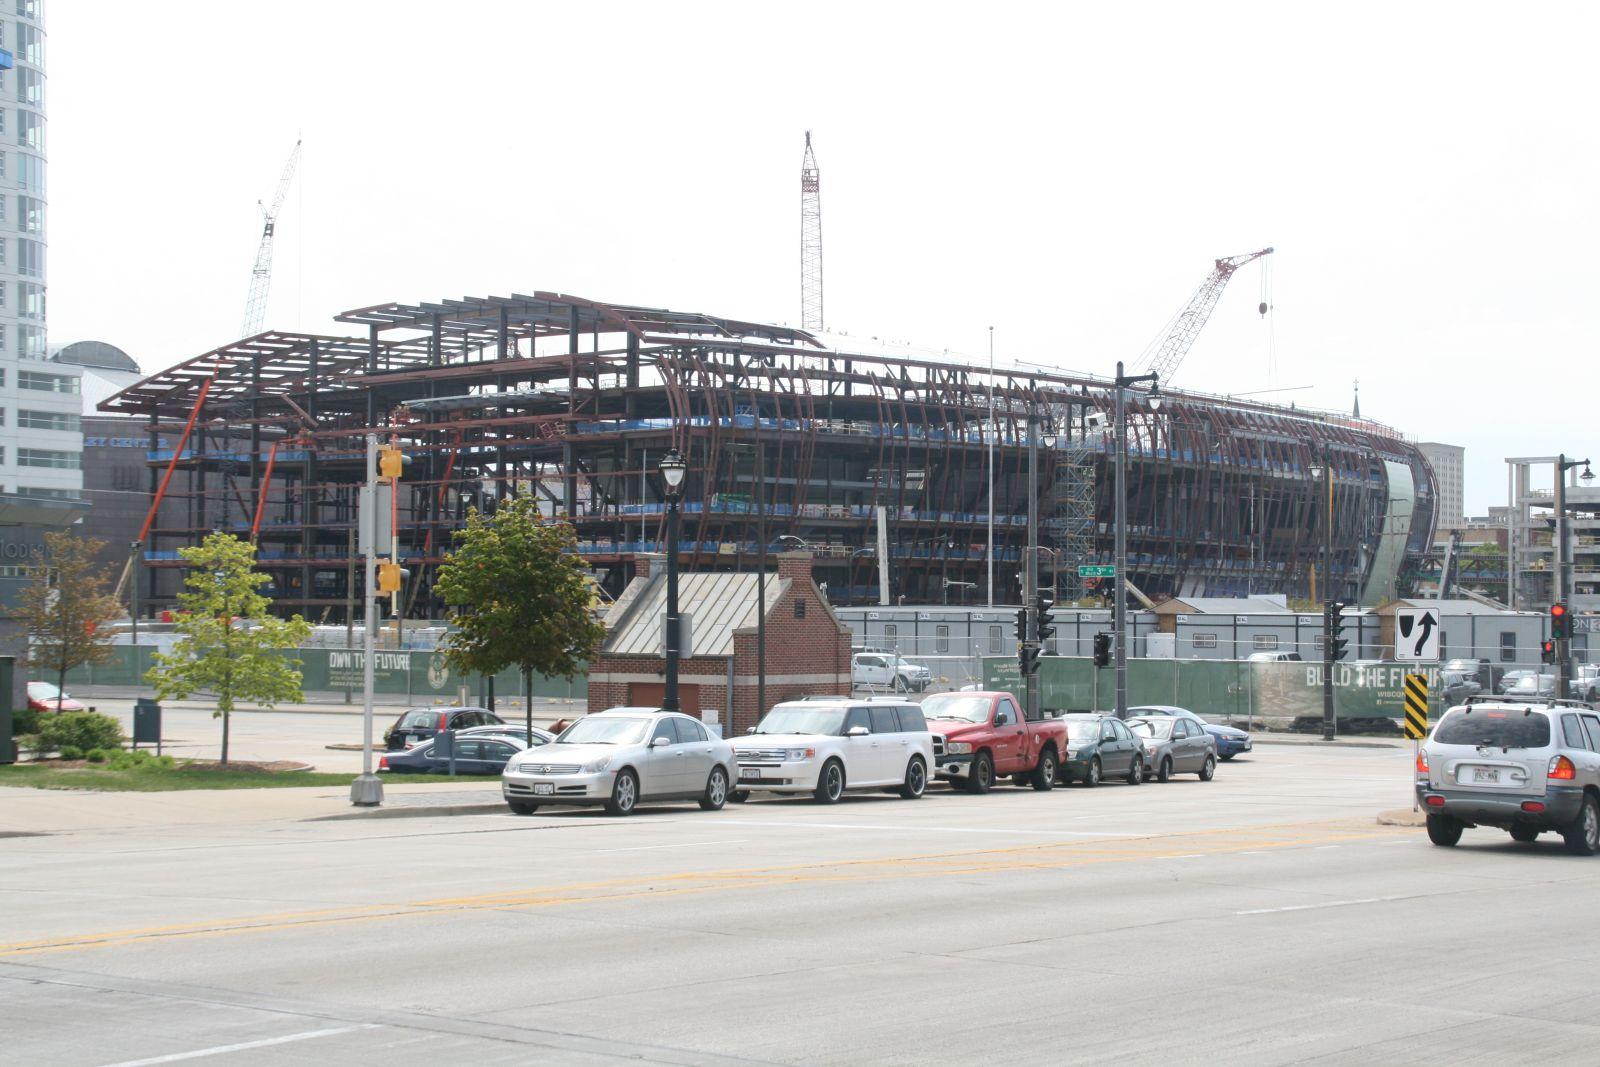 Wisconsin Entertainment & Sports Center Construction